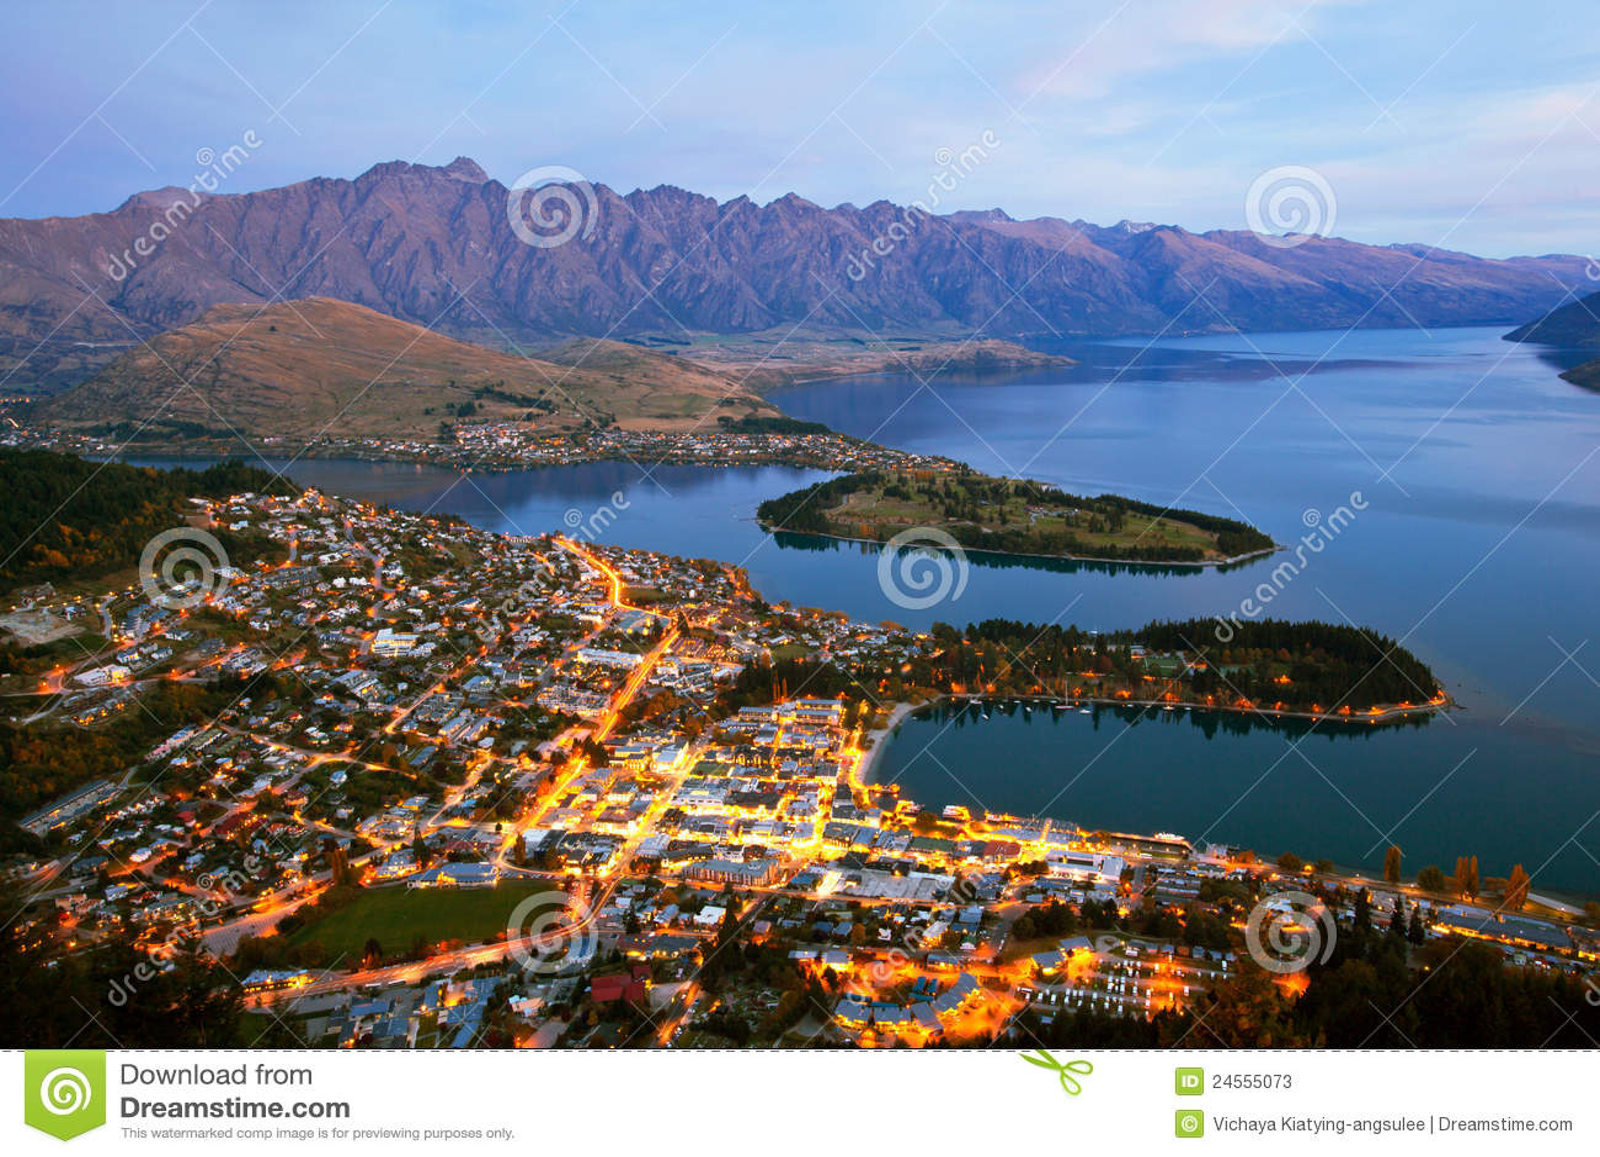 New Zealand Time Image: Queenstown New Zealand Stock Photos